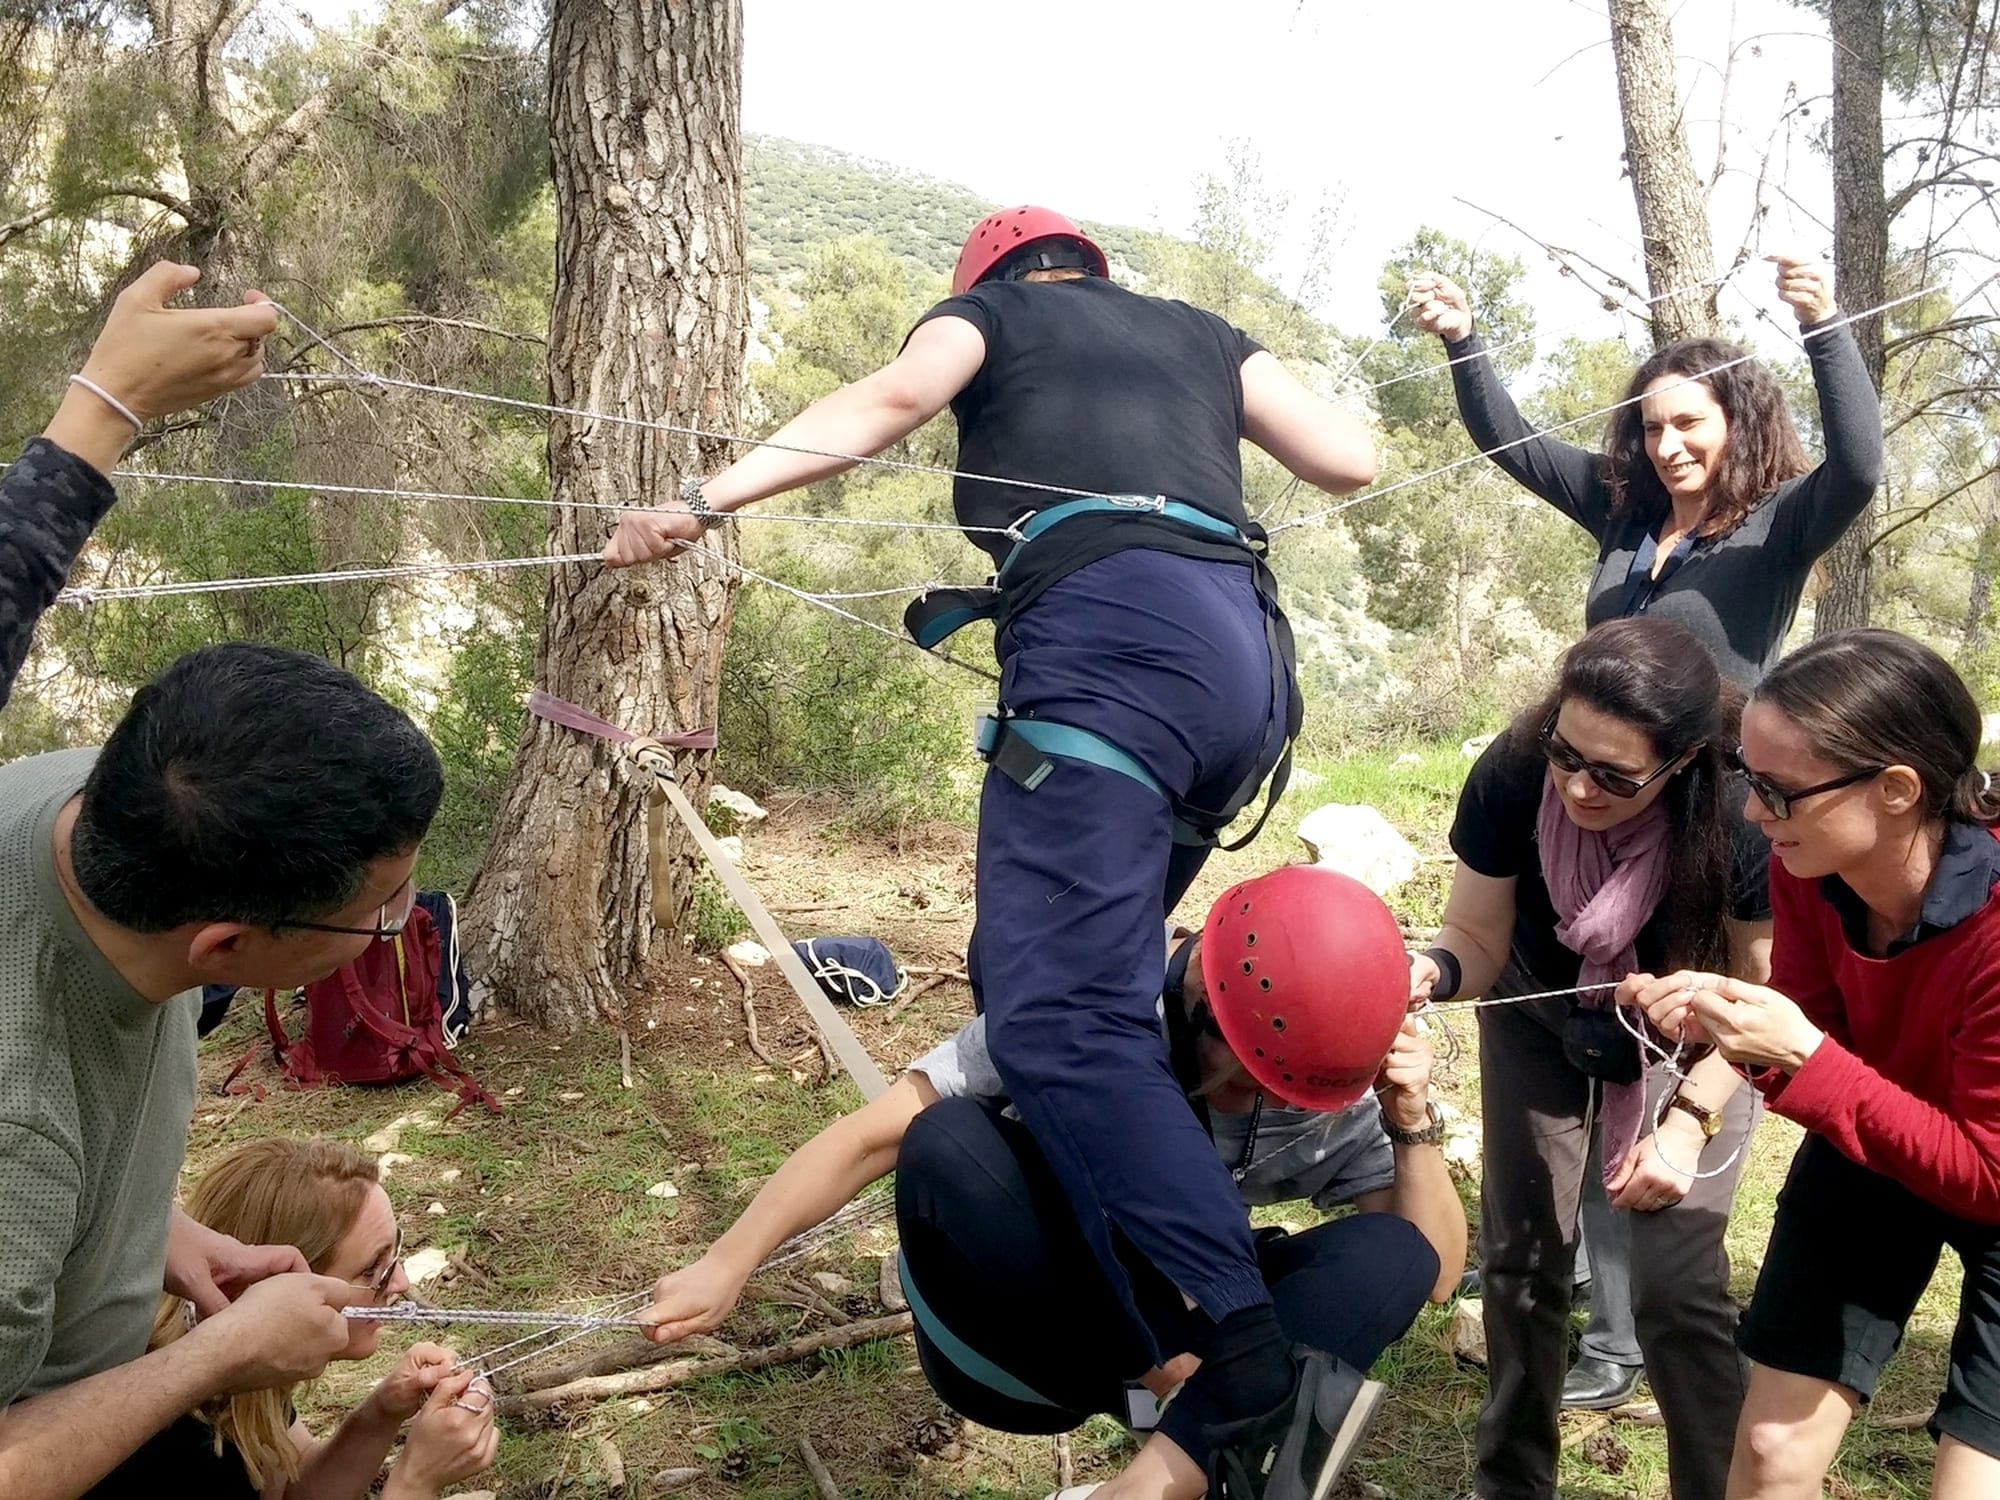 outdoor training - סדנת מנהלים - ערוצים בטבע